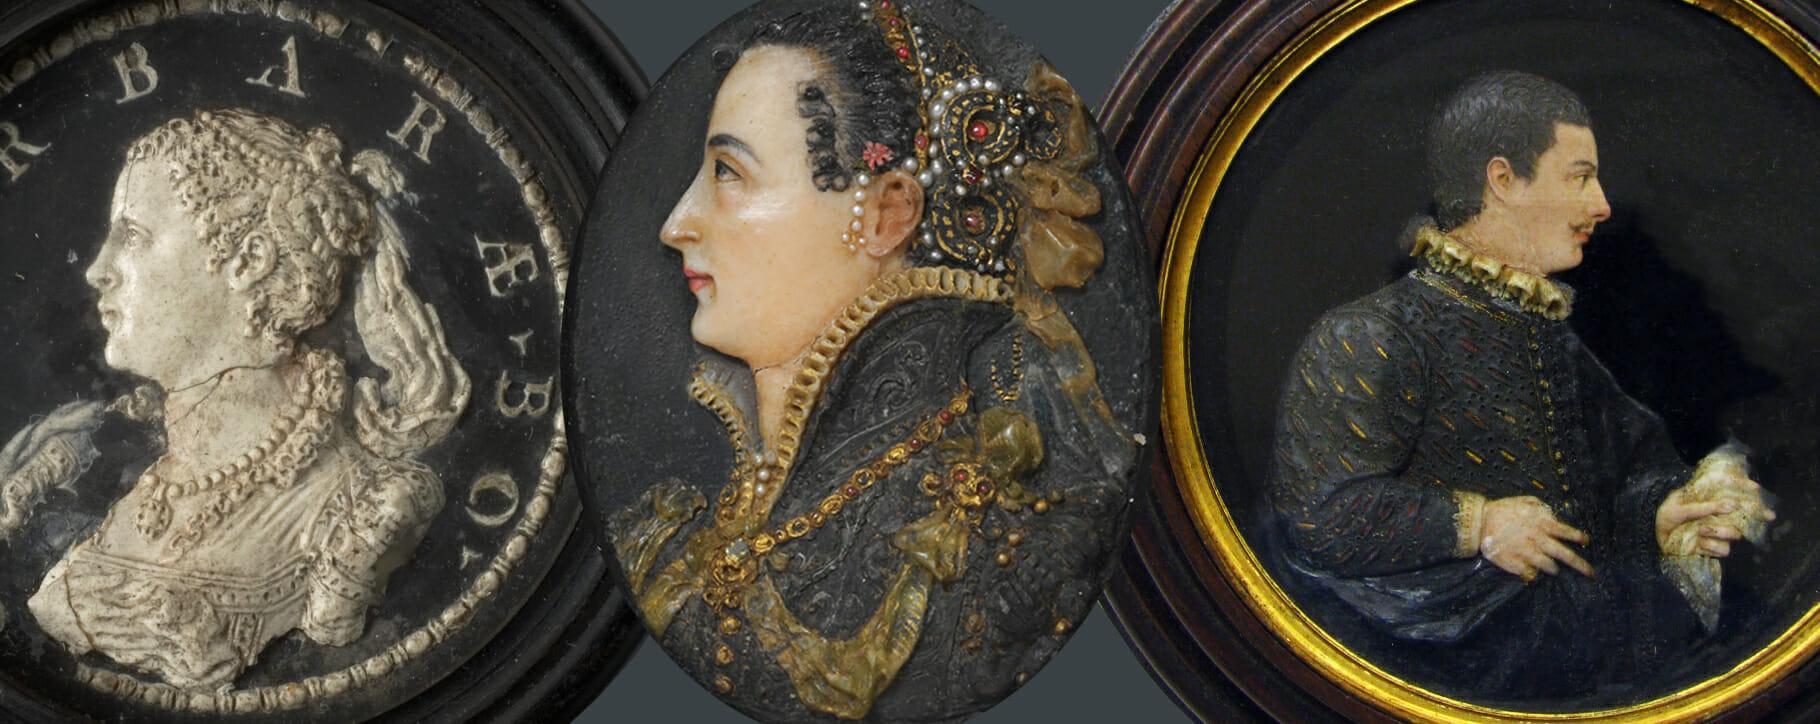 Renaissance Wax Portraits 16th Century